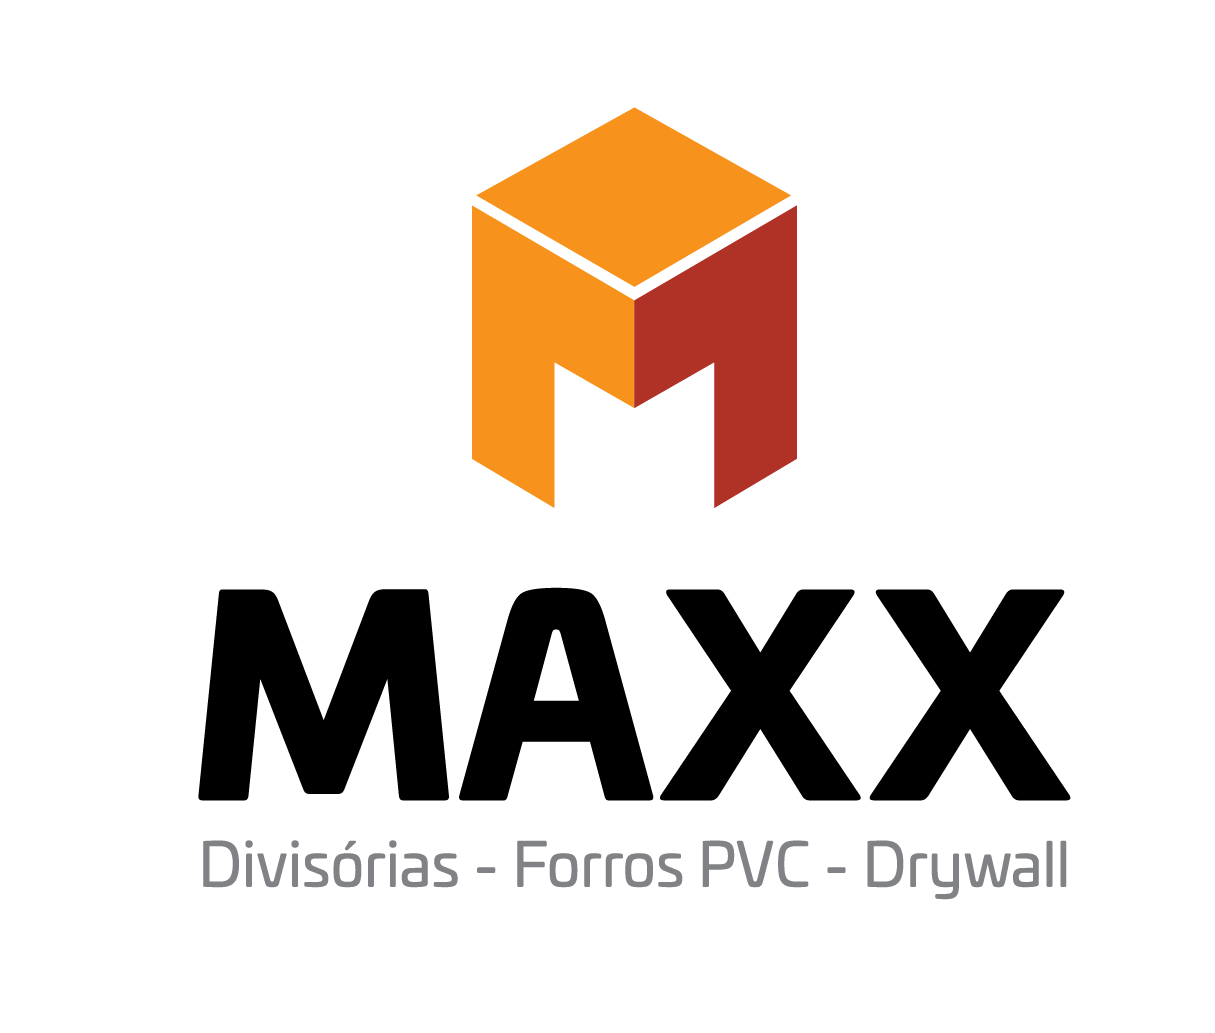 drywall para banheiro - Maxx Forro